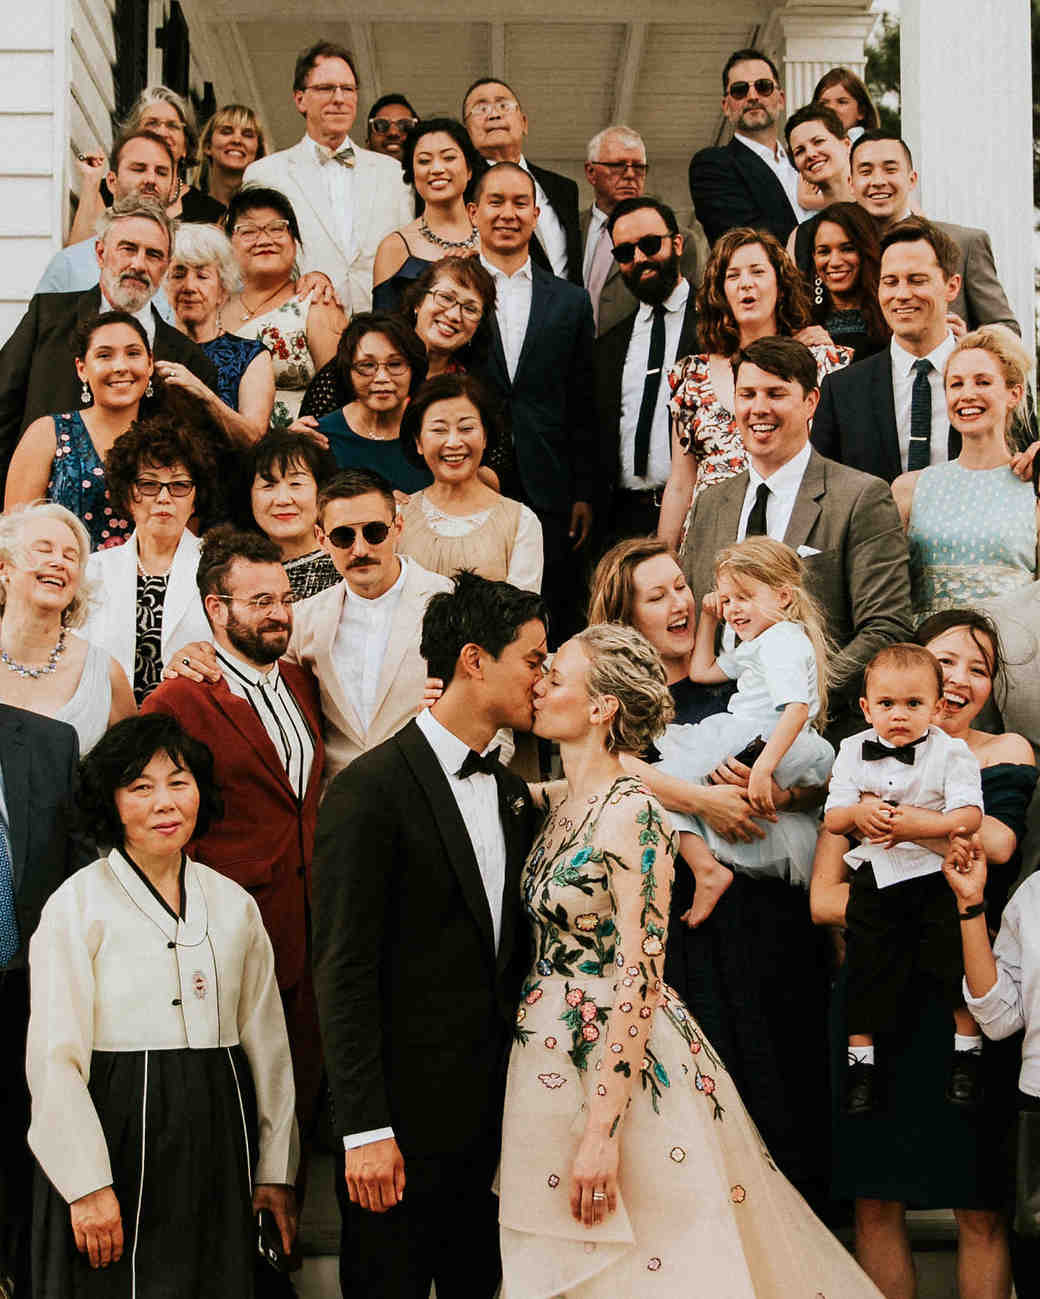 leah michael wedding group photo couple kiss